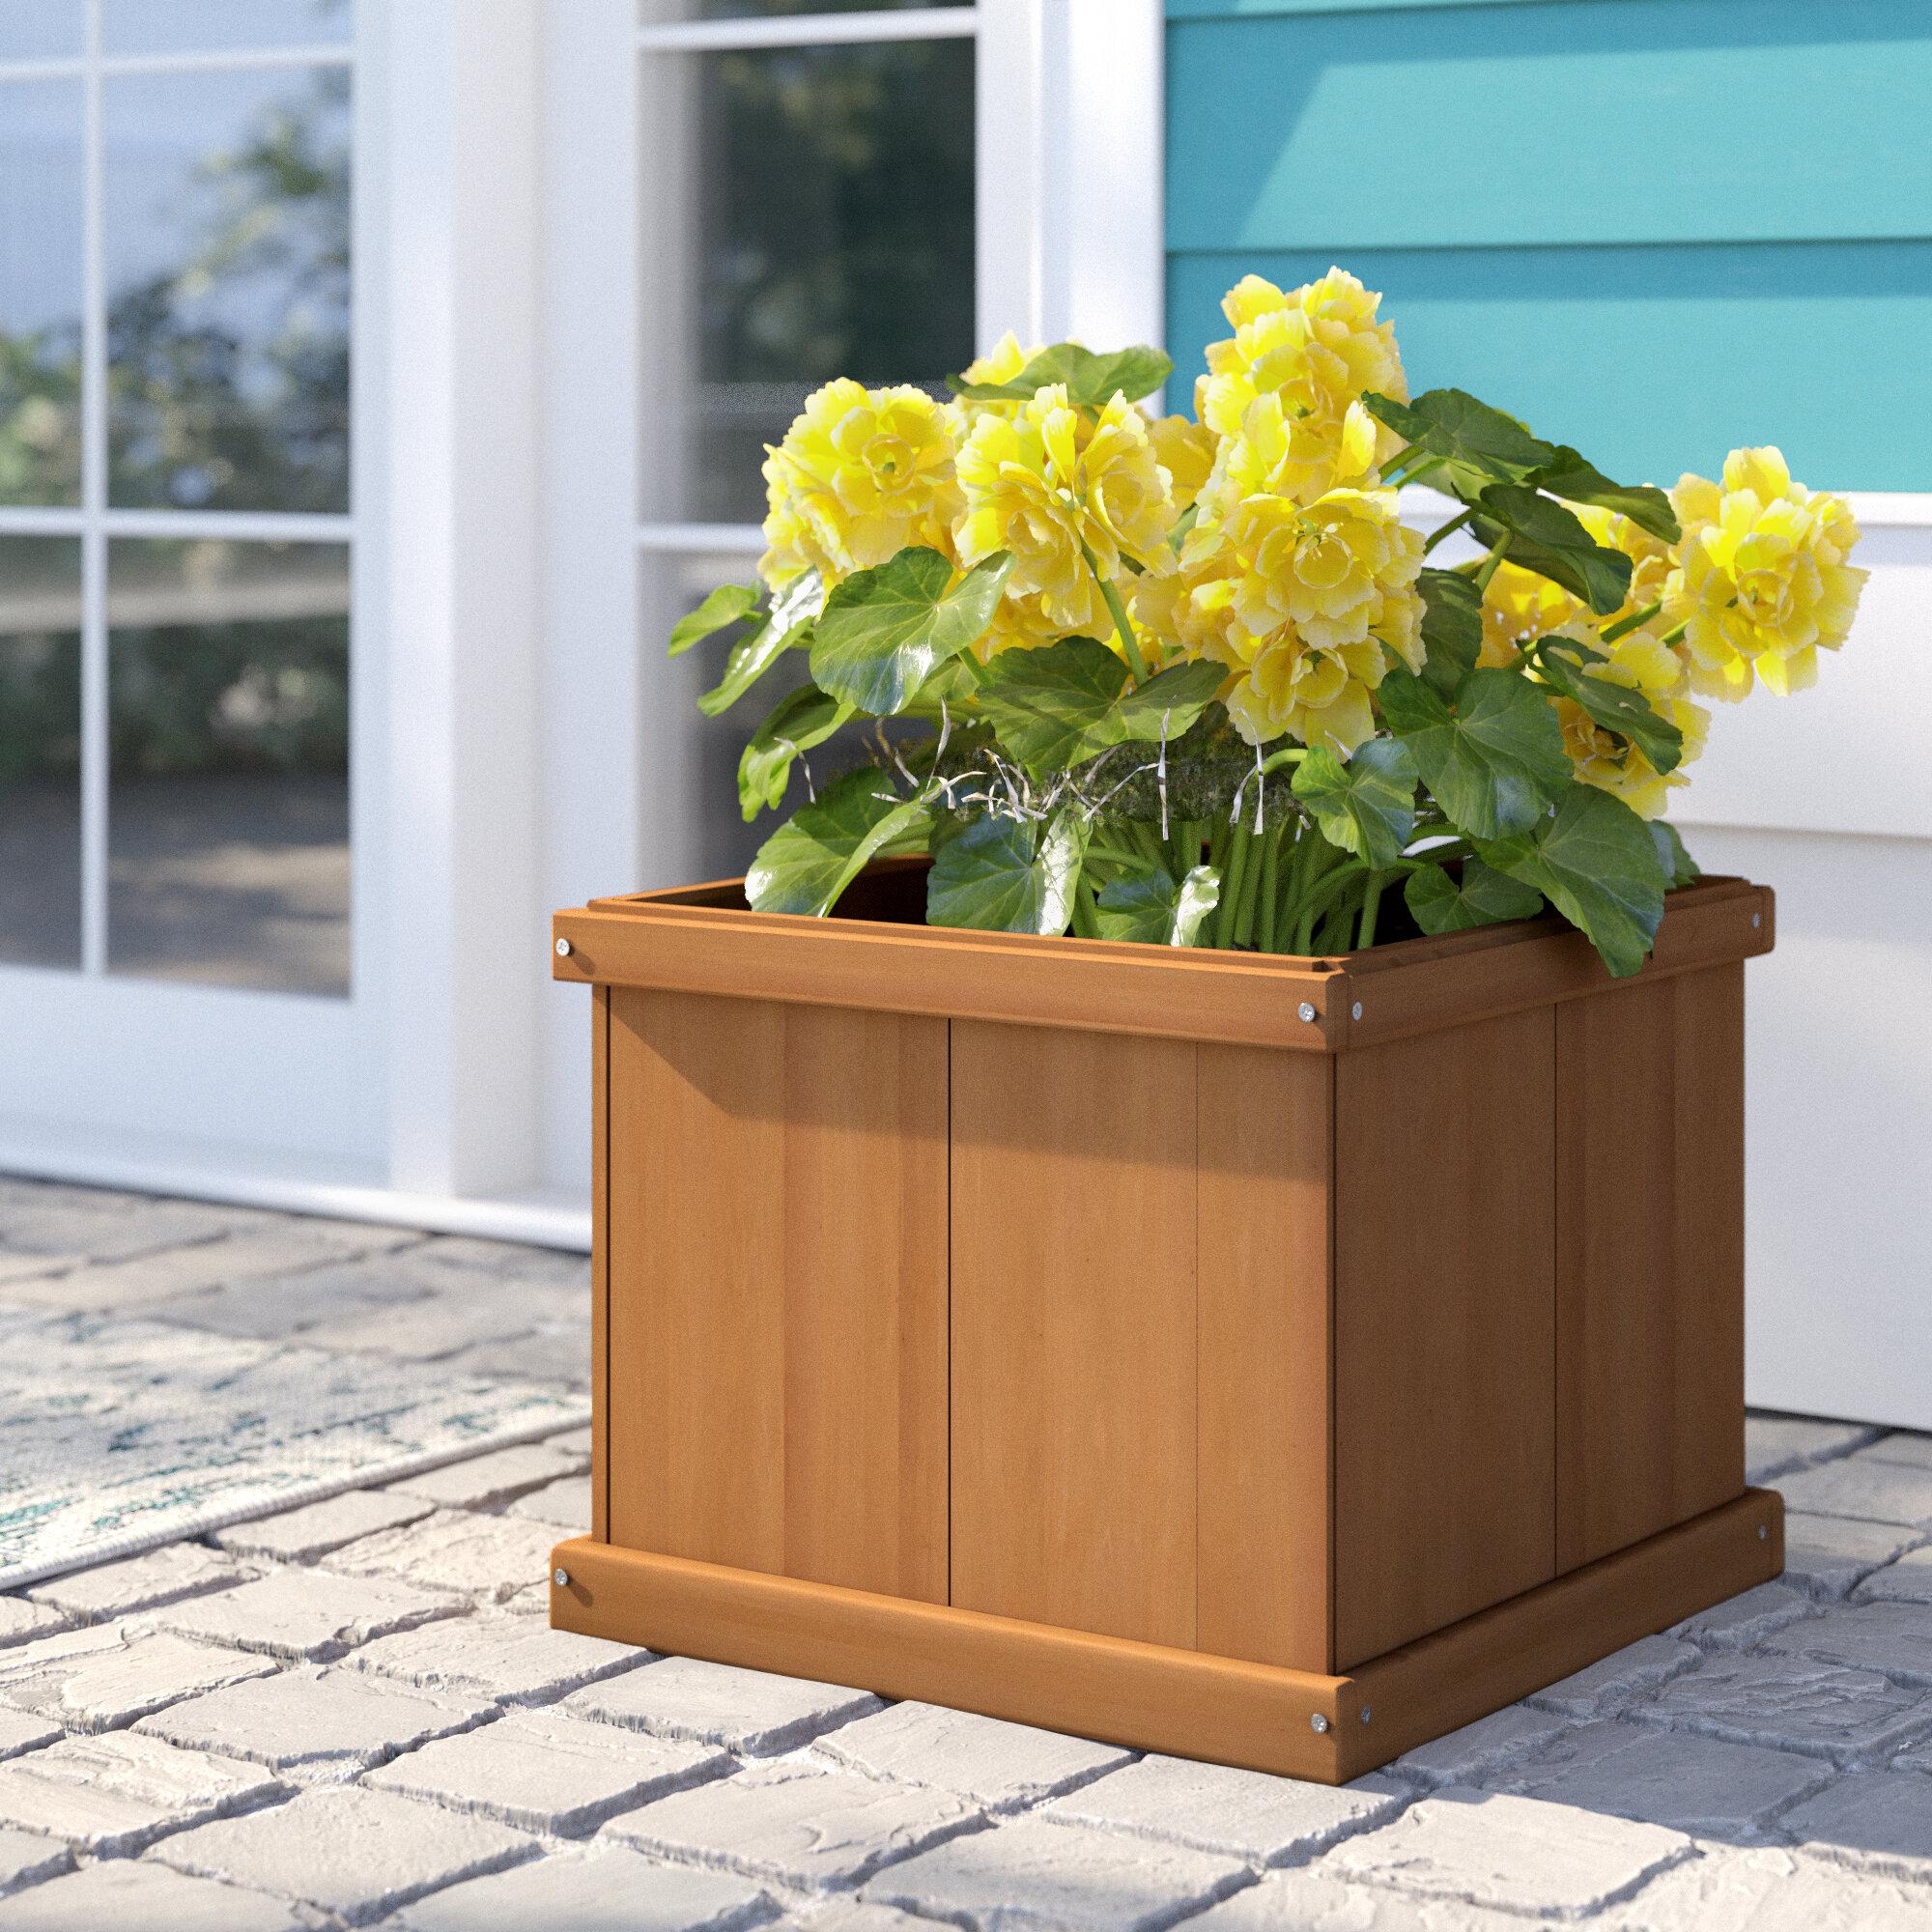 Flower Planter Cedar Wood Garden Patio Porch Rustic Decor Yard Backyard Entryway